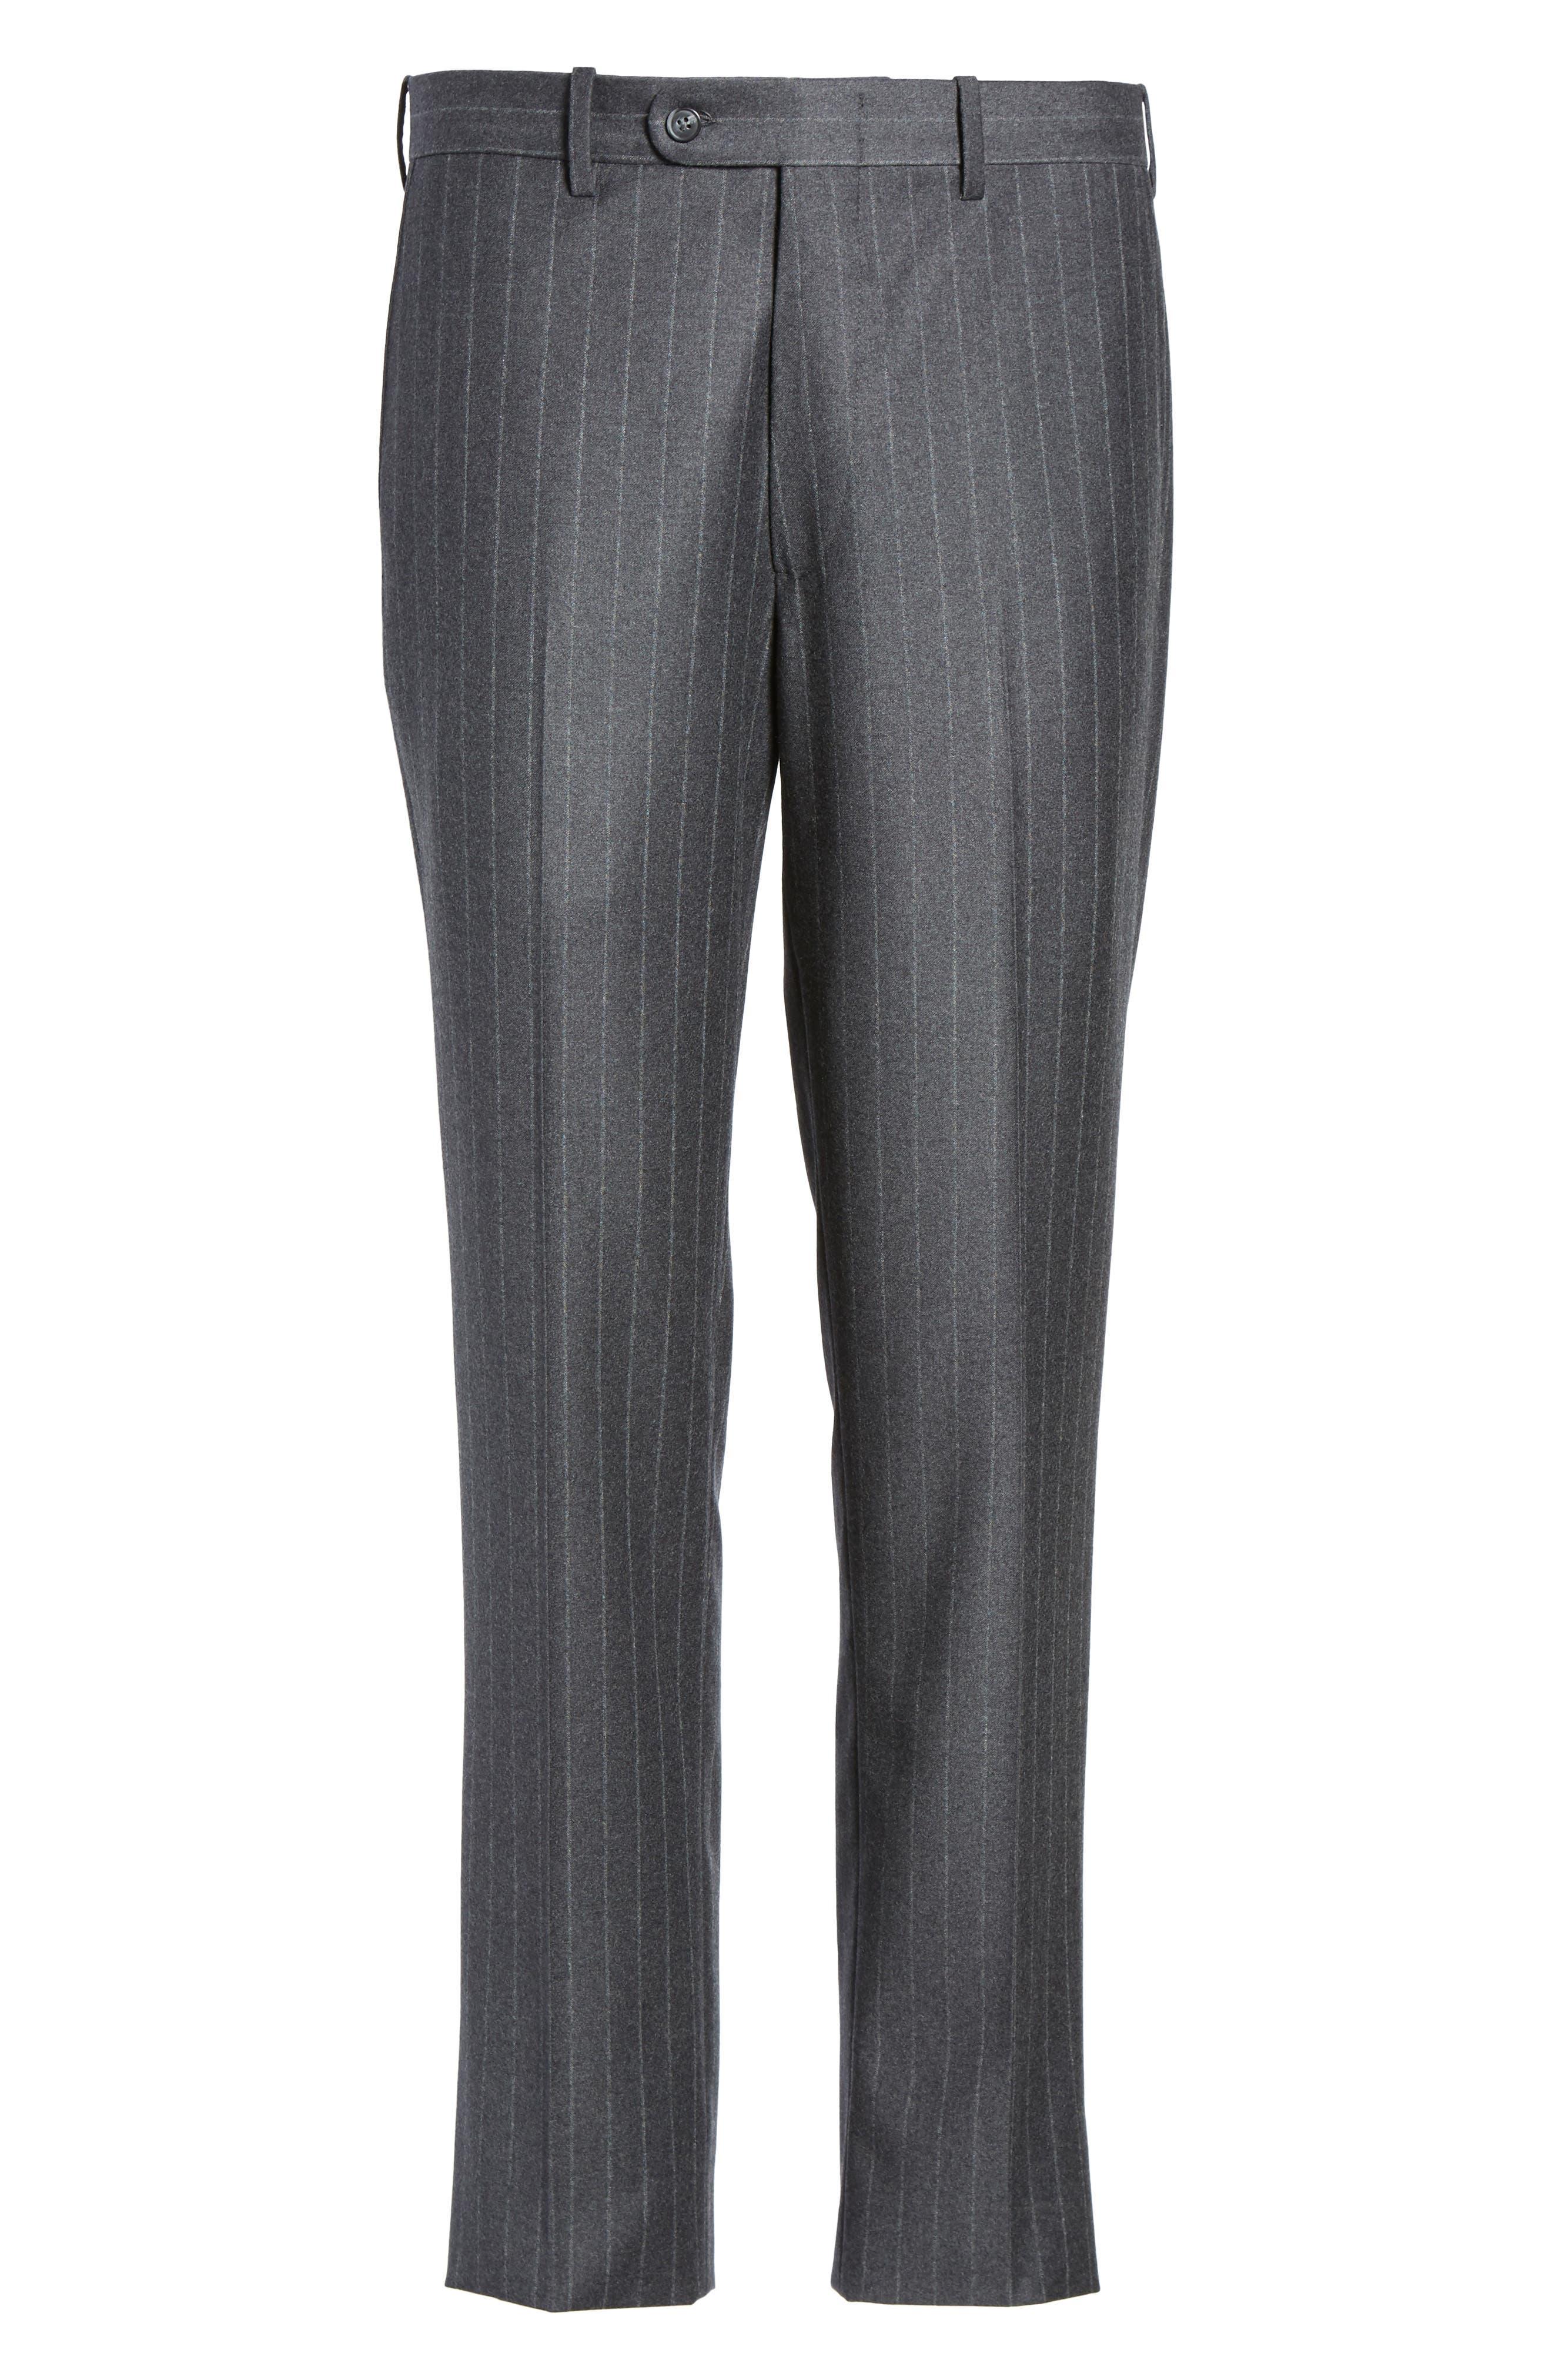 Flat Front Chalk Stripe Wool Trousers,                             Alternate thumbnail 6, color,                             030